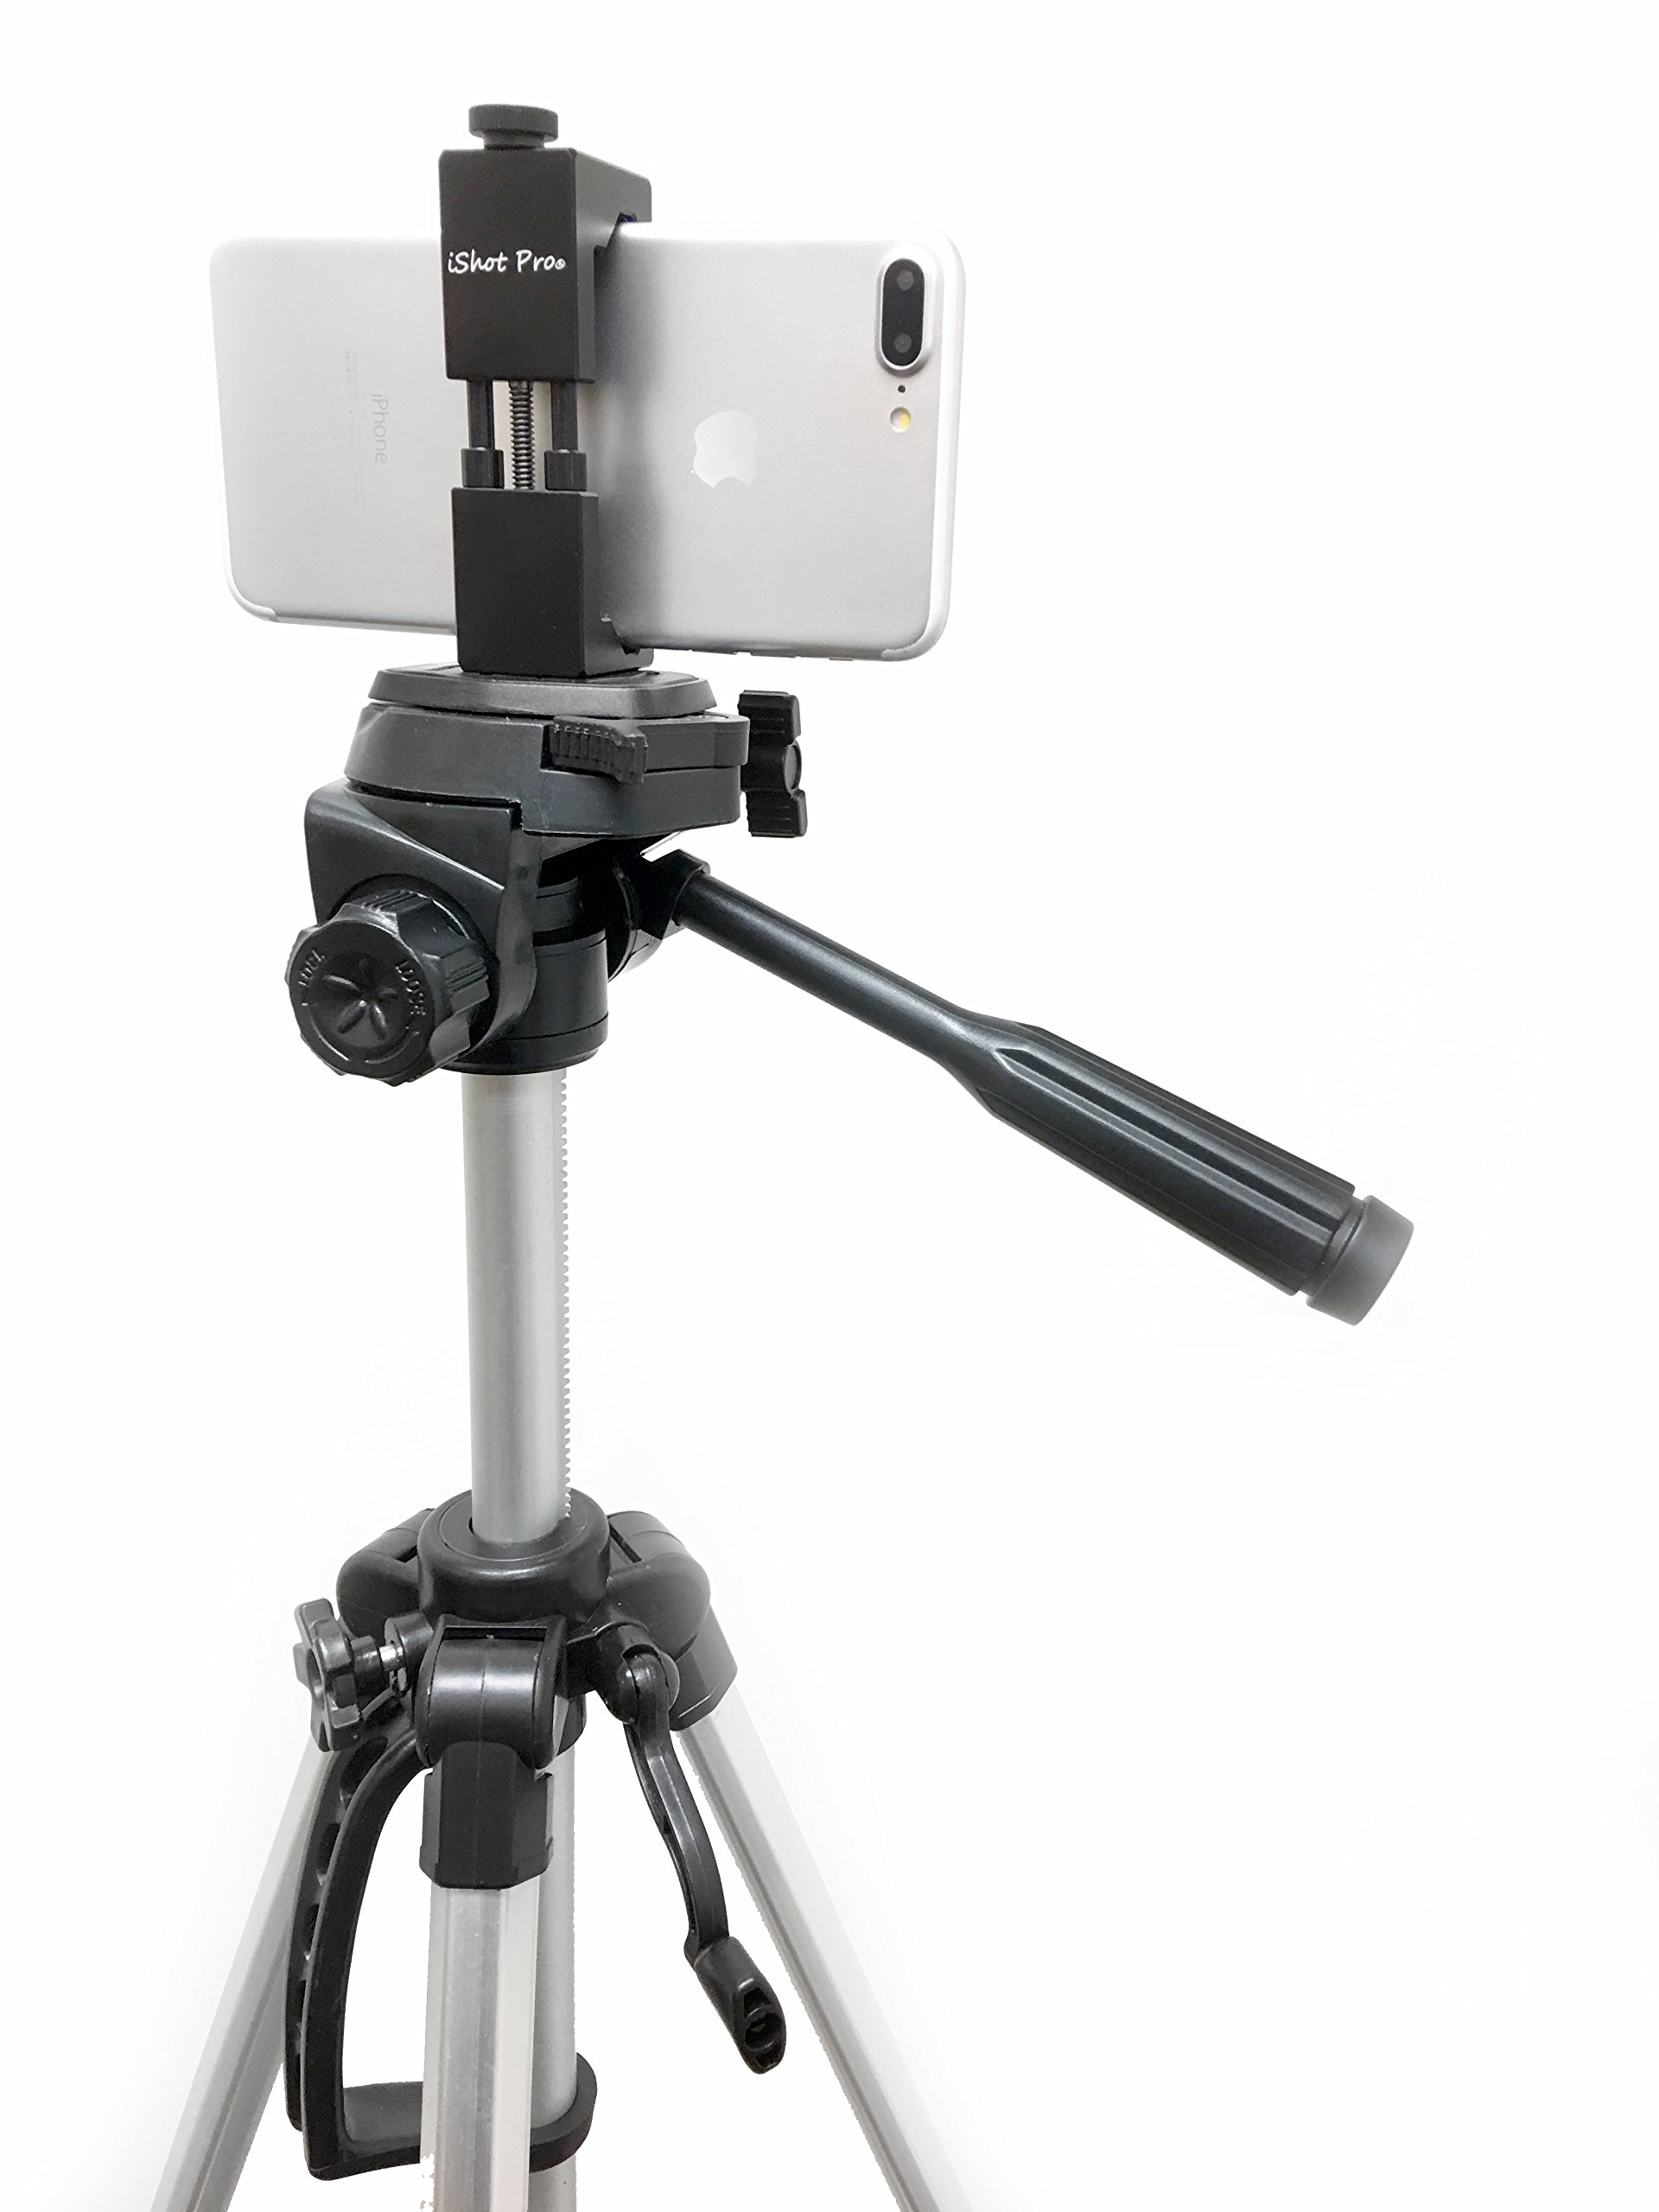 360/° Swivel Ball Head iShot Pro SecureGrip Metal iPhone Universal Smartphone Tripod Monopod Mount Adapter Hand-held GRIPstick Extendable Monopod Compatible with iPhone /& Smartphone 2.5 to 3.6